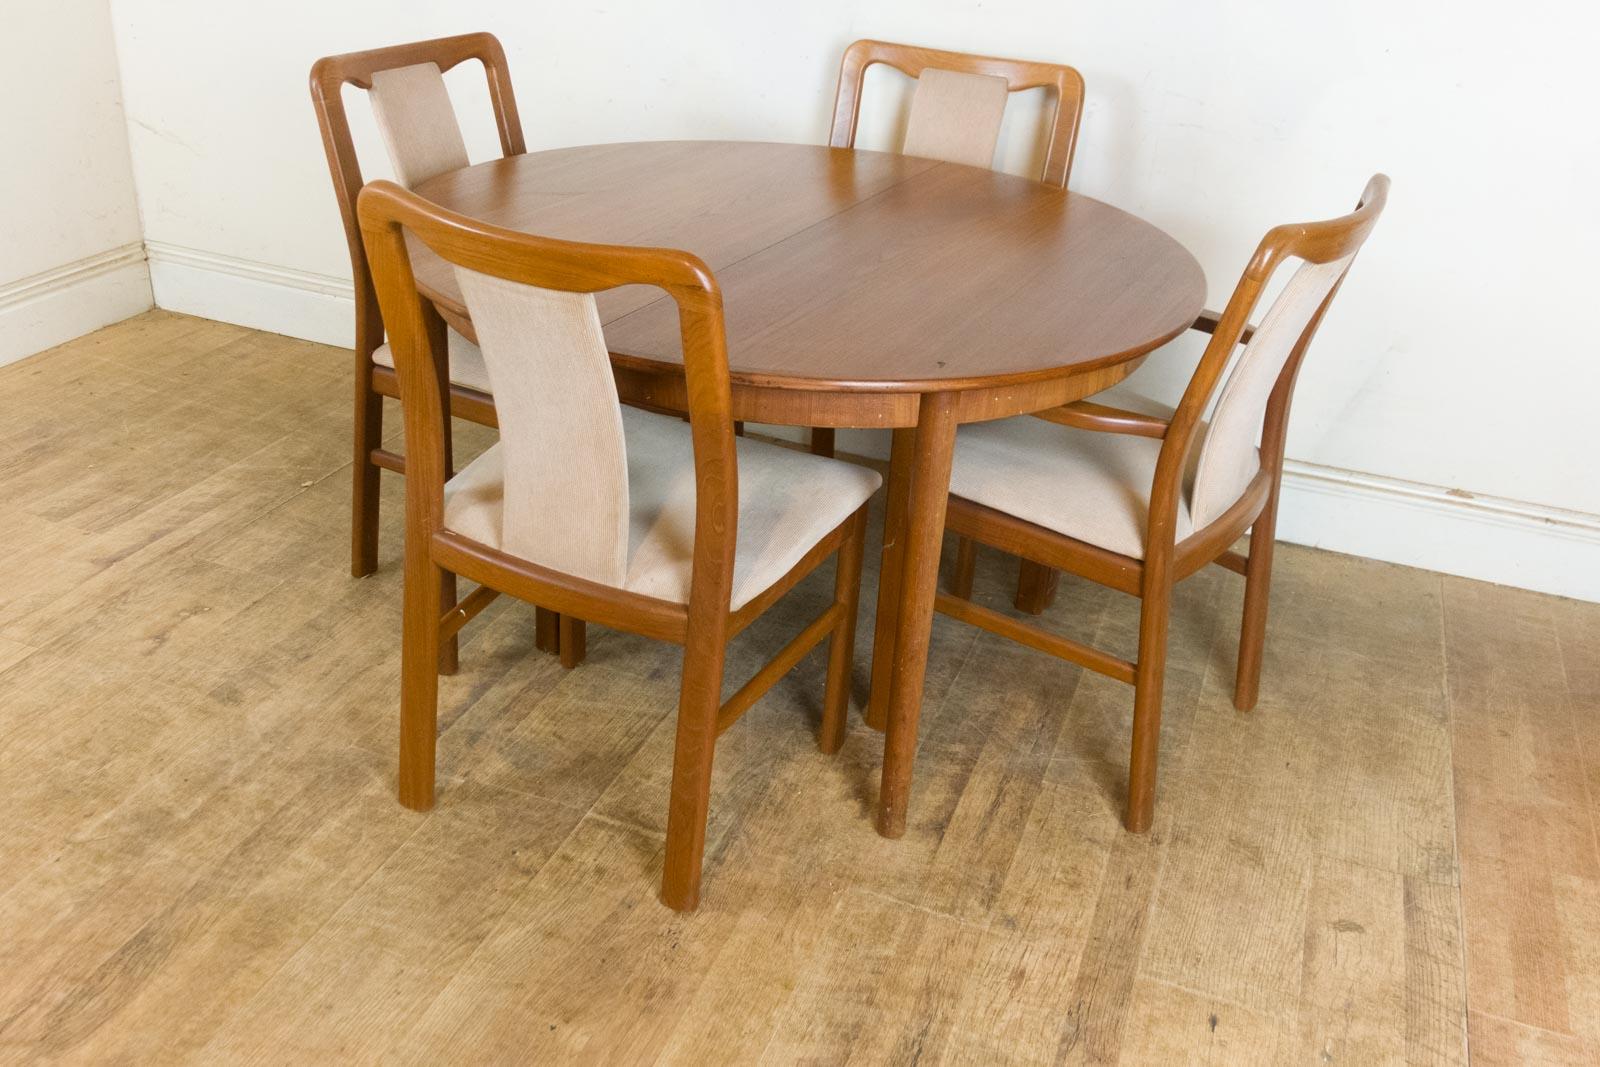 retro dining table chairs uk bodybilt stretch ergonomic chair (j2509 and j3509) vintage danish extending 6